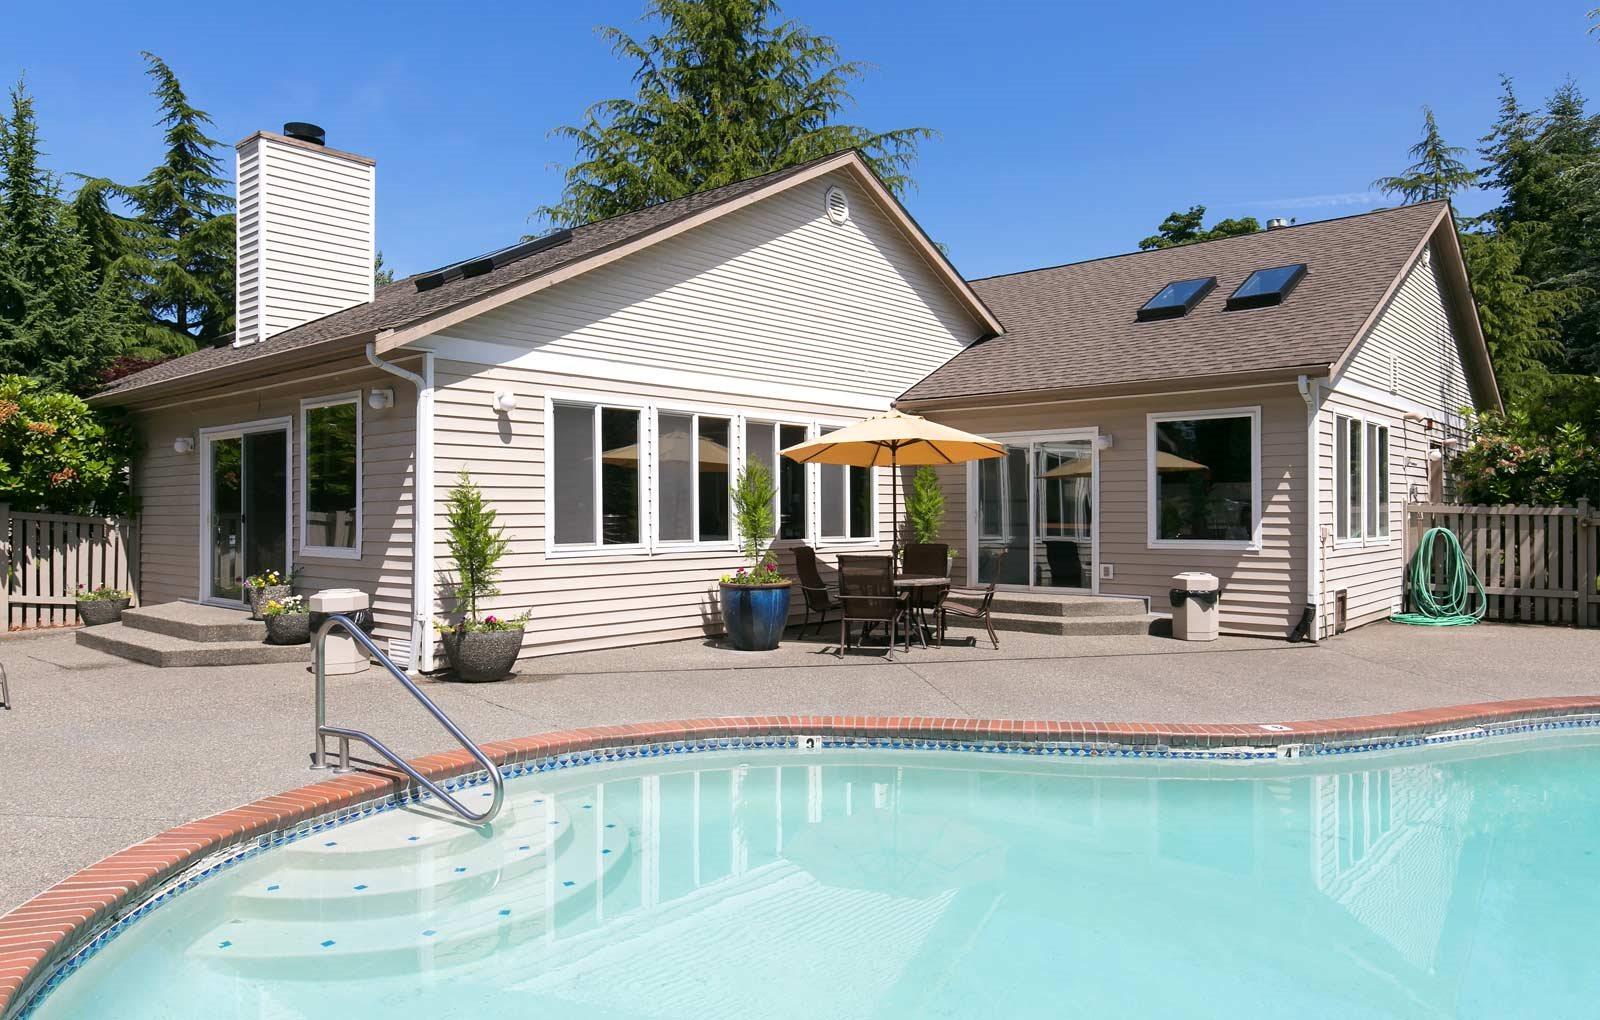 Silverlake Apartments in Everett, WA sparkling swimming pool